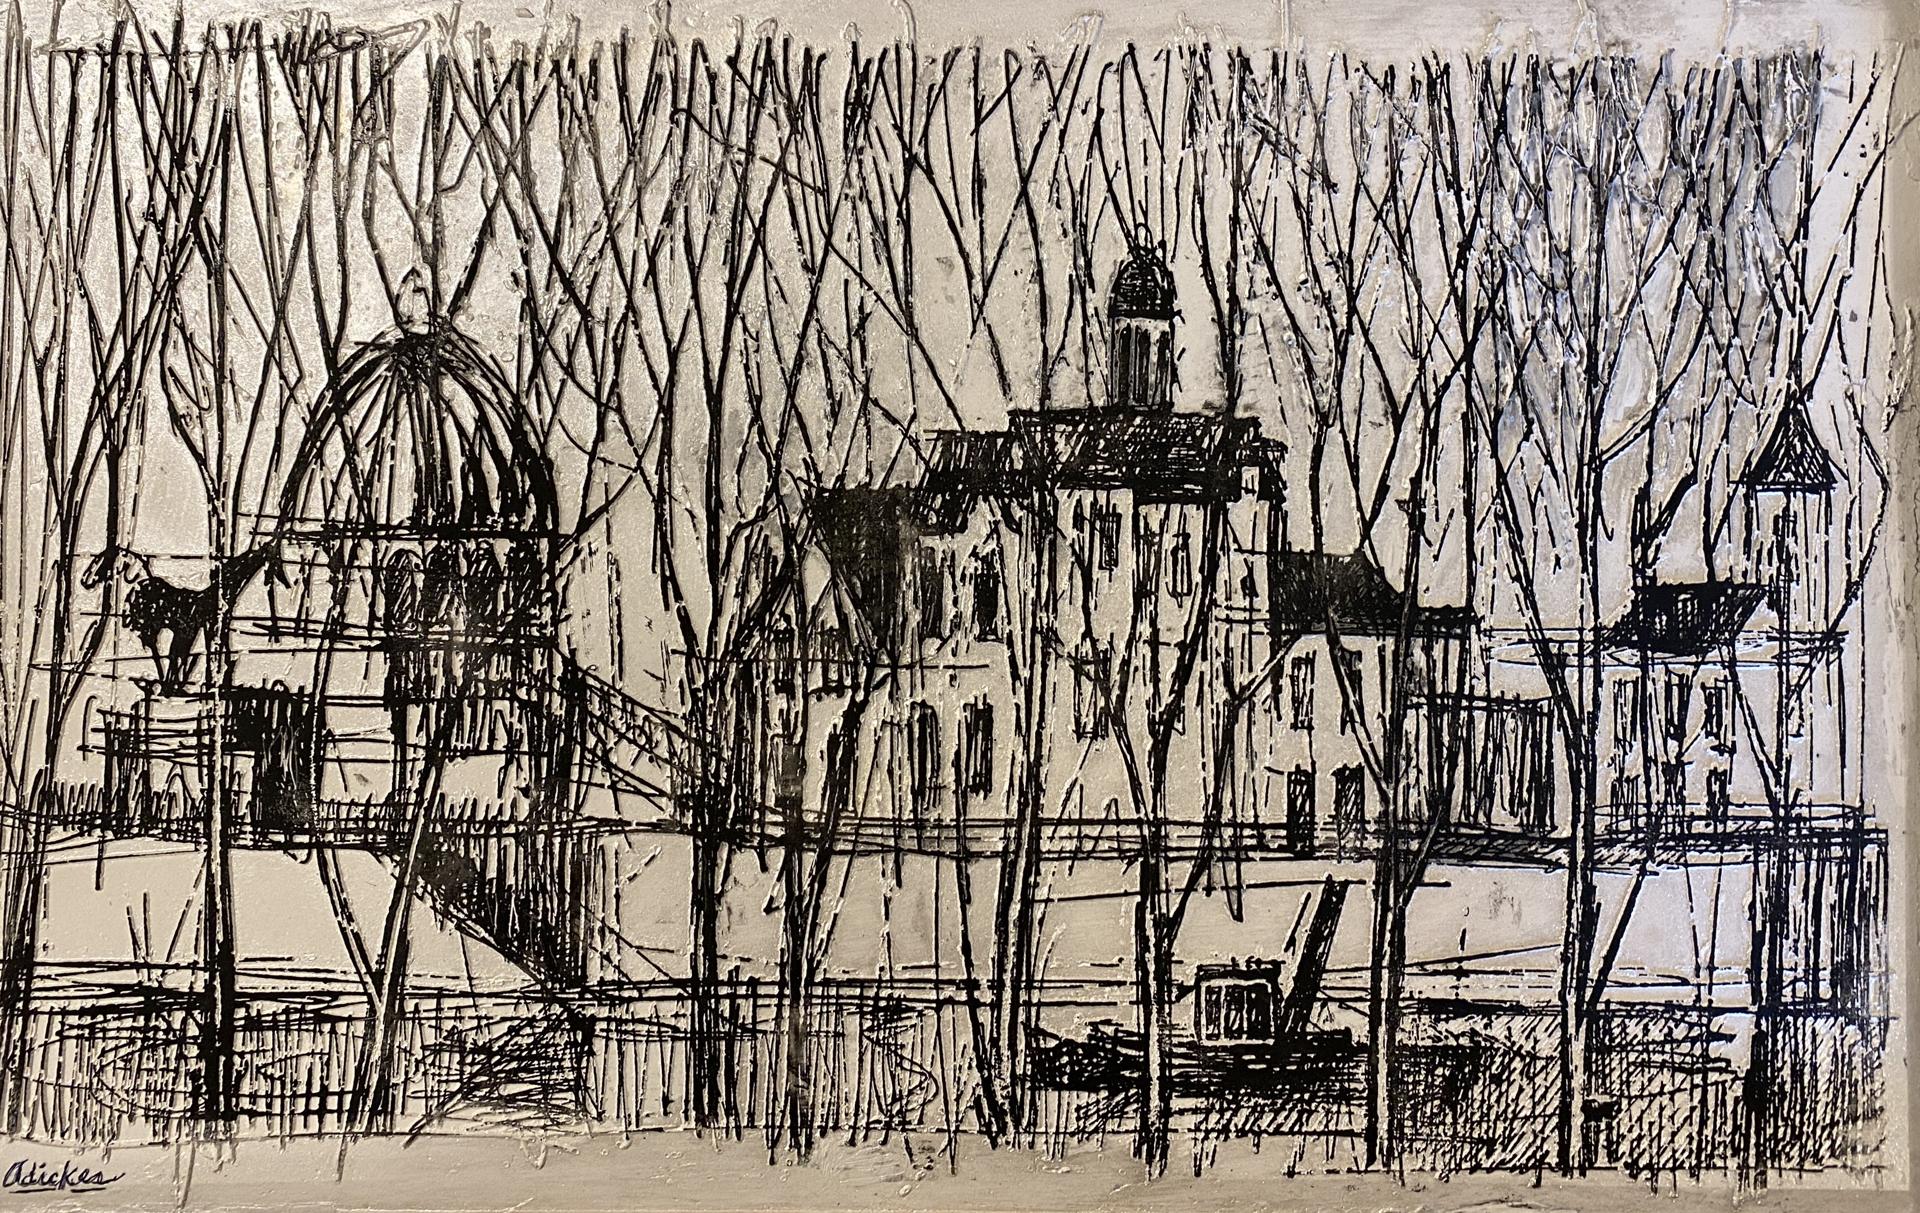 Walk on the Seine by David Adickes